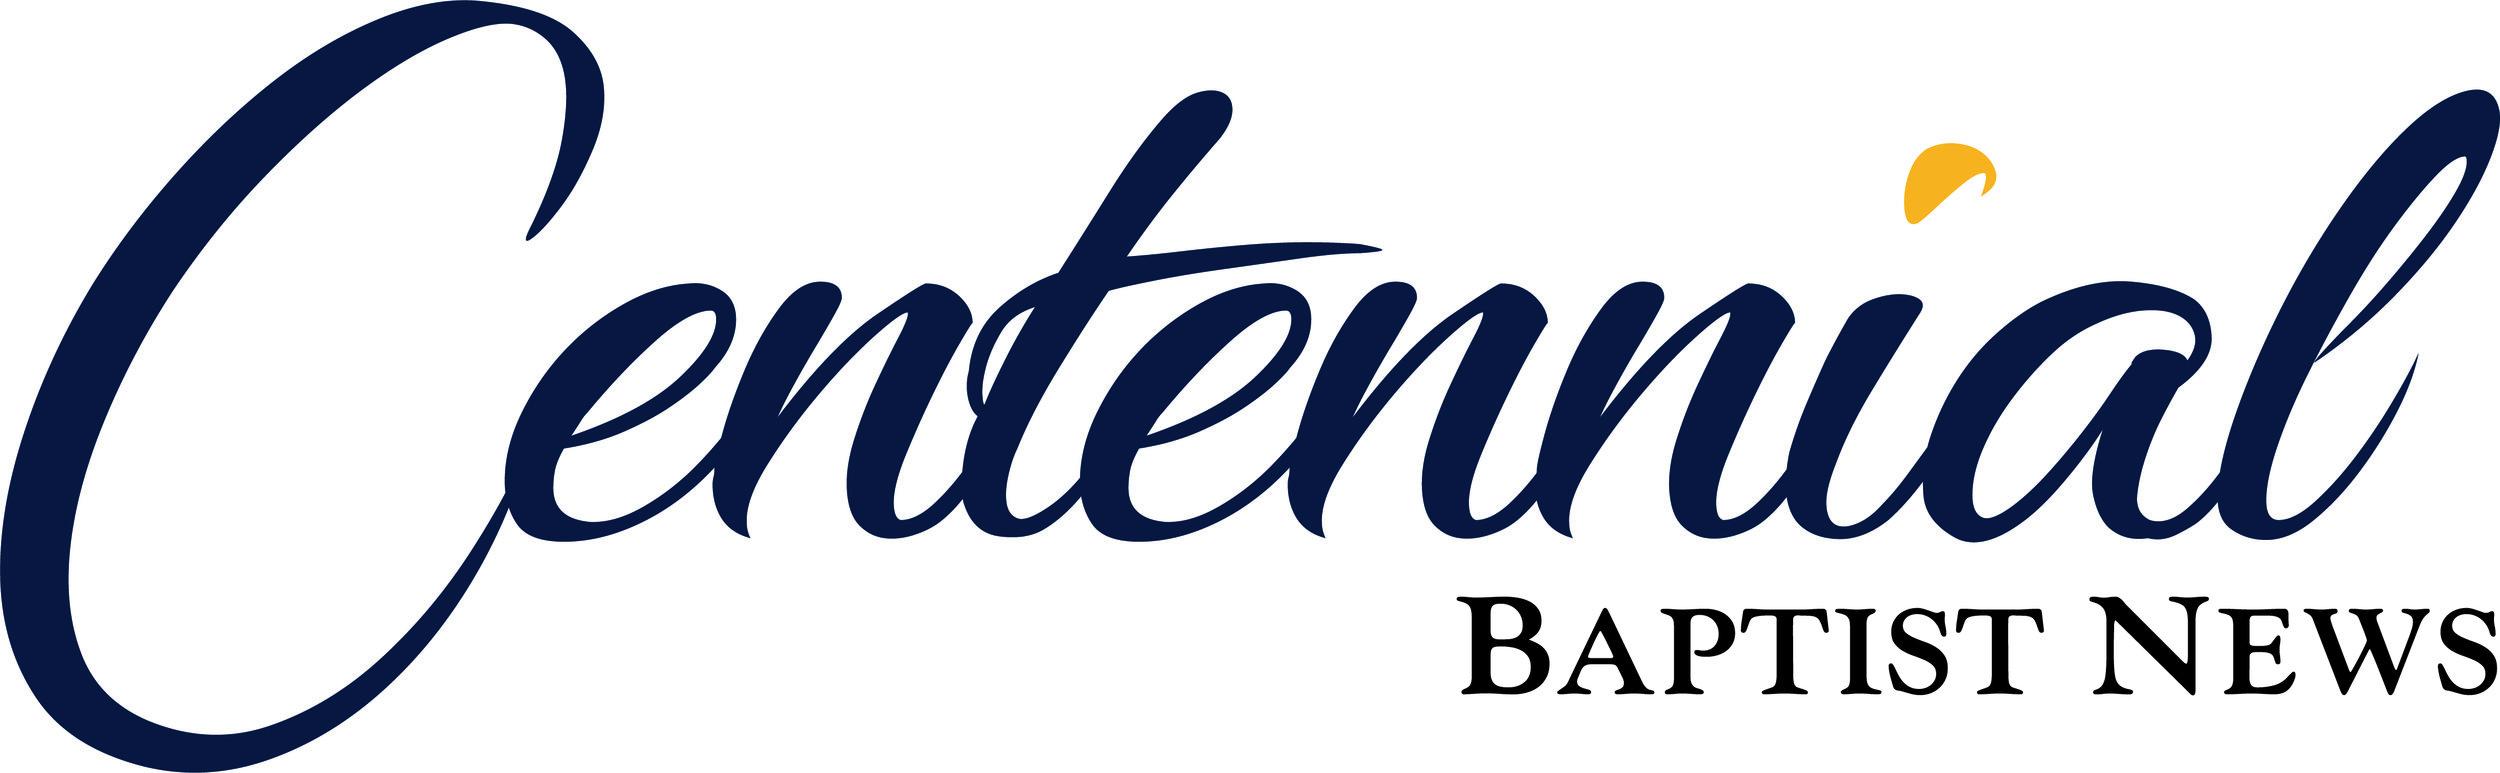 CBA Baptist News logo.jpg